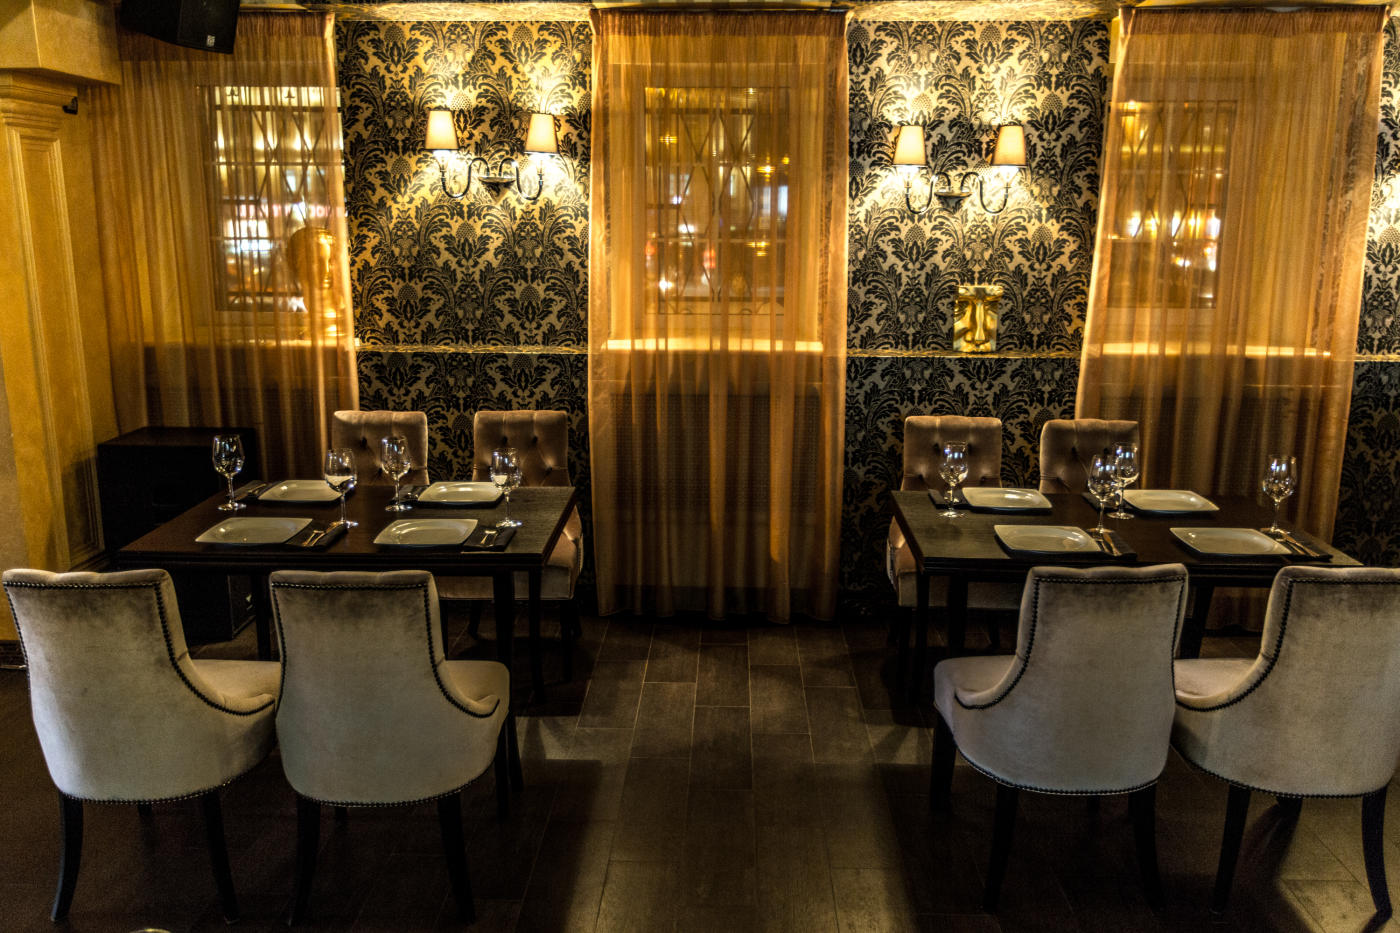 Ресторан Graff Lounge (Граф Лаунж) фото 4